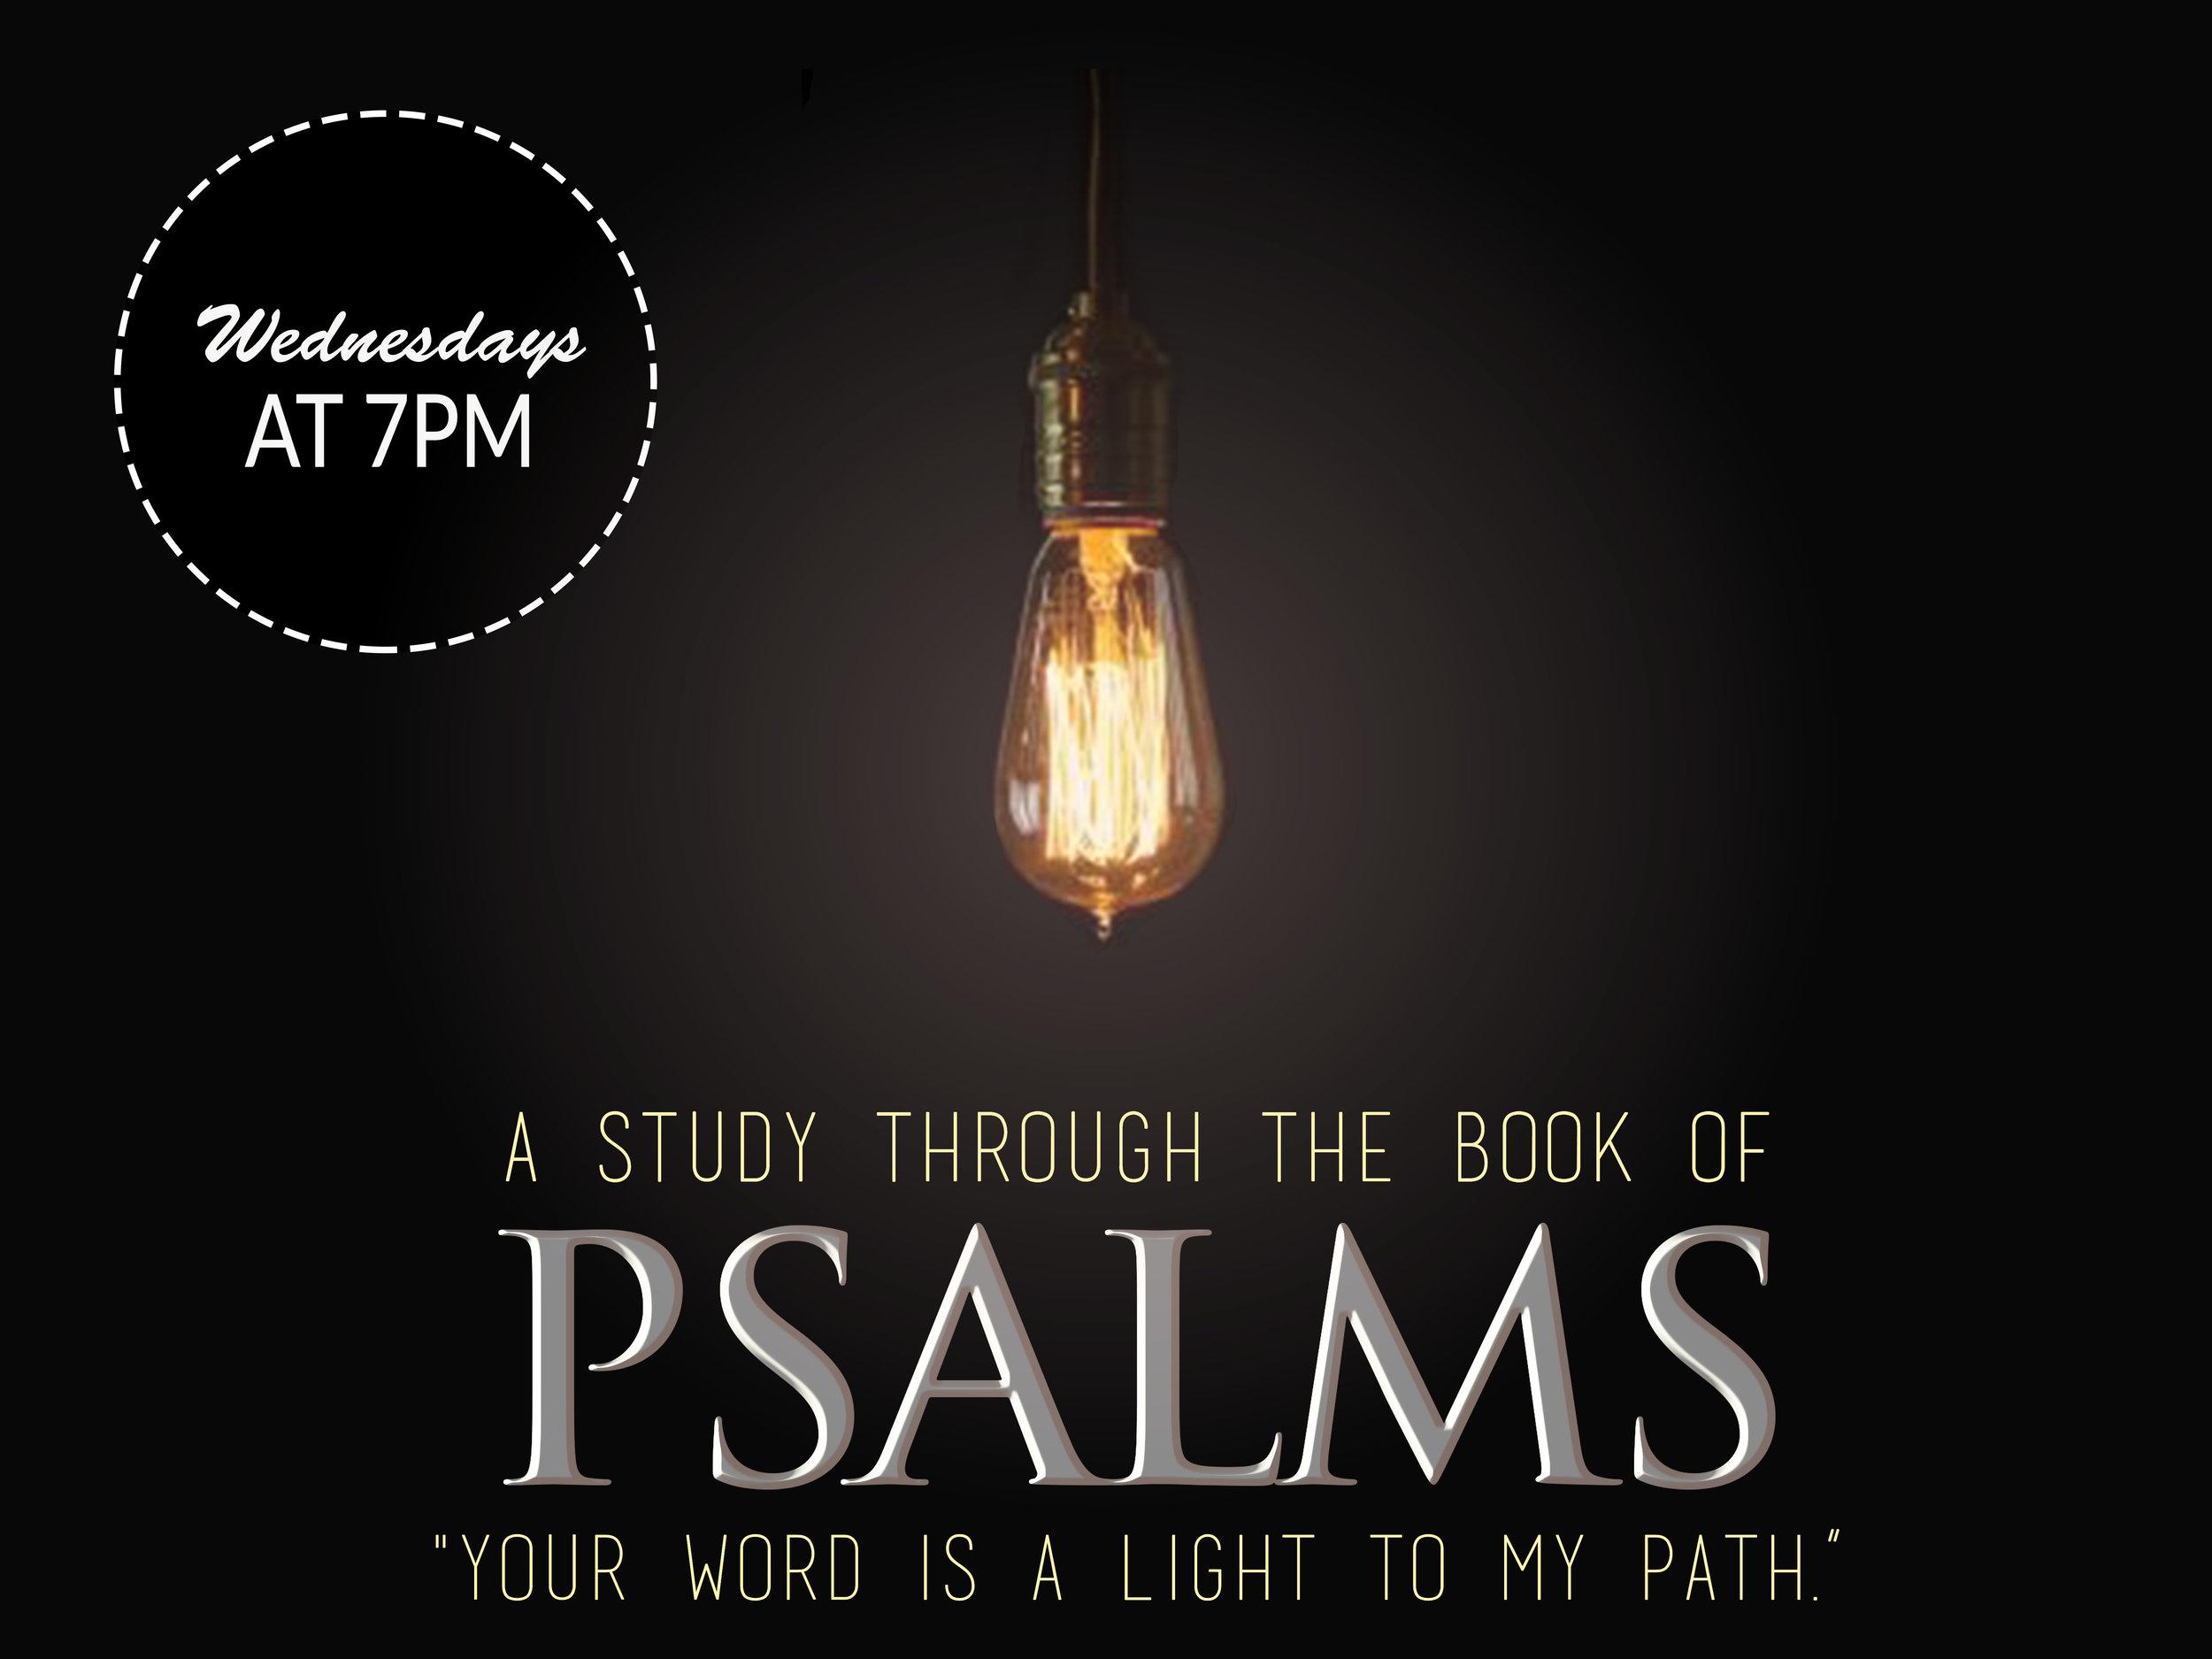 psalms promo2 800x600.jpg